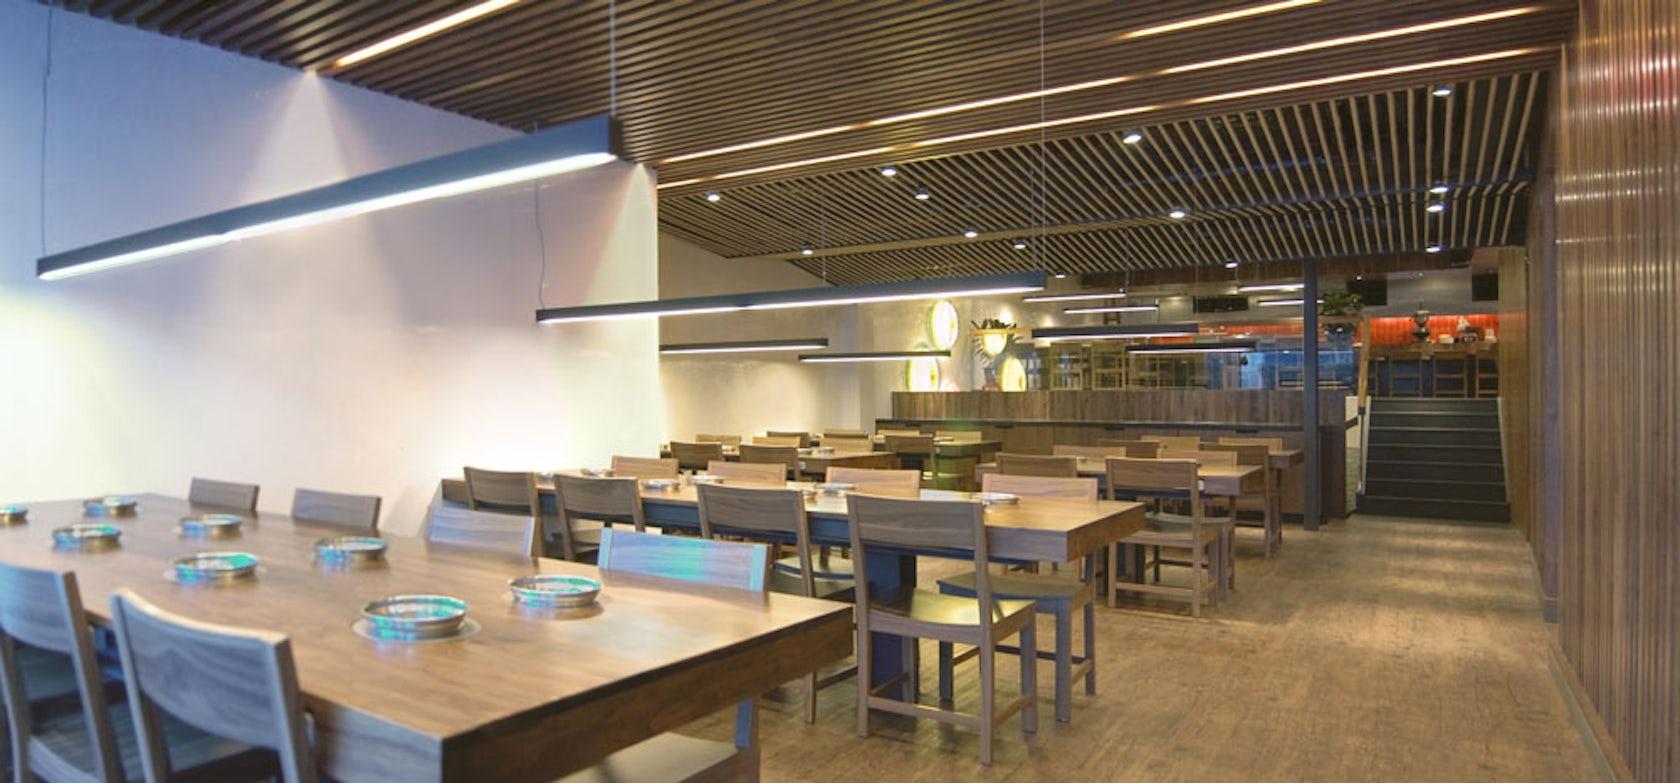 Shabu restaurant queens ny architizer